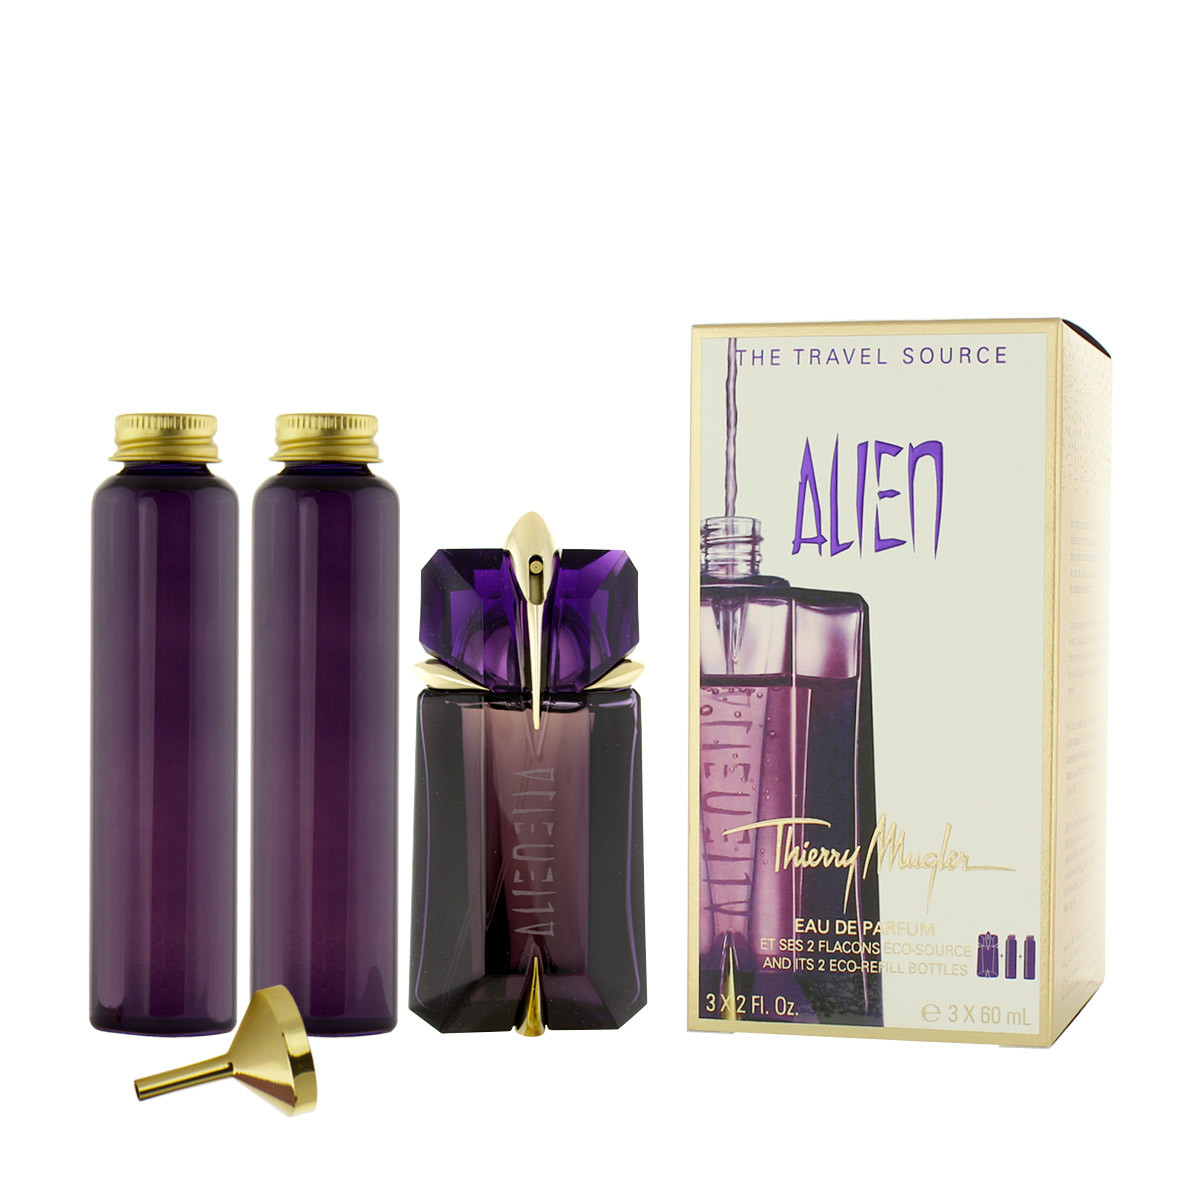 thierry mugler alien edp nachf llbar 60 ml edp nachf llung 2 x 60 ml woman alien thierry. Black Bedroom Furniture Sets. Home Design Ideas